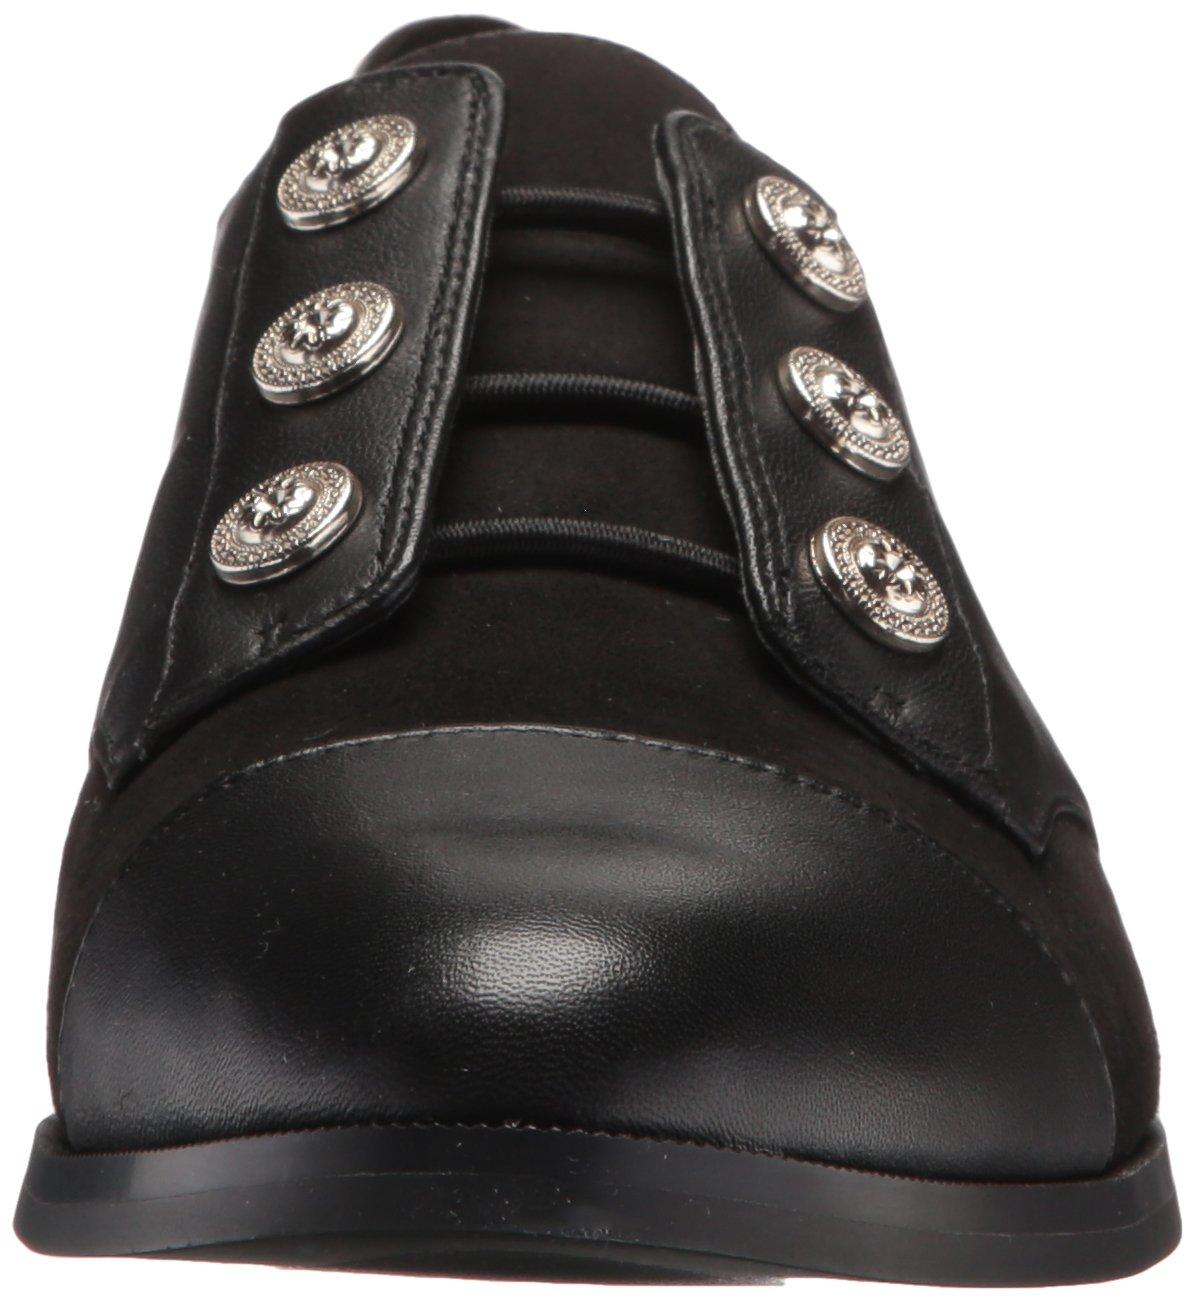 Nine West Women's Here Leather Uniform Dress Shoe, Black/Multi Leather, 5 M US by Nine West (Image #4)